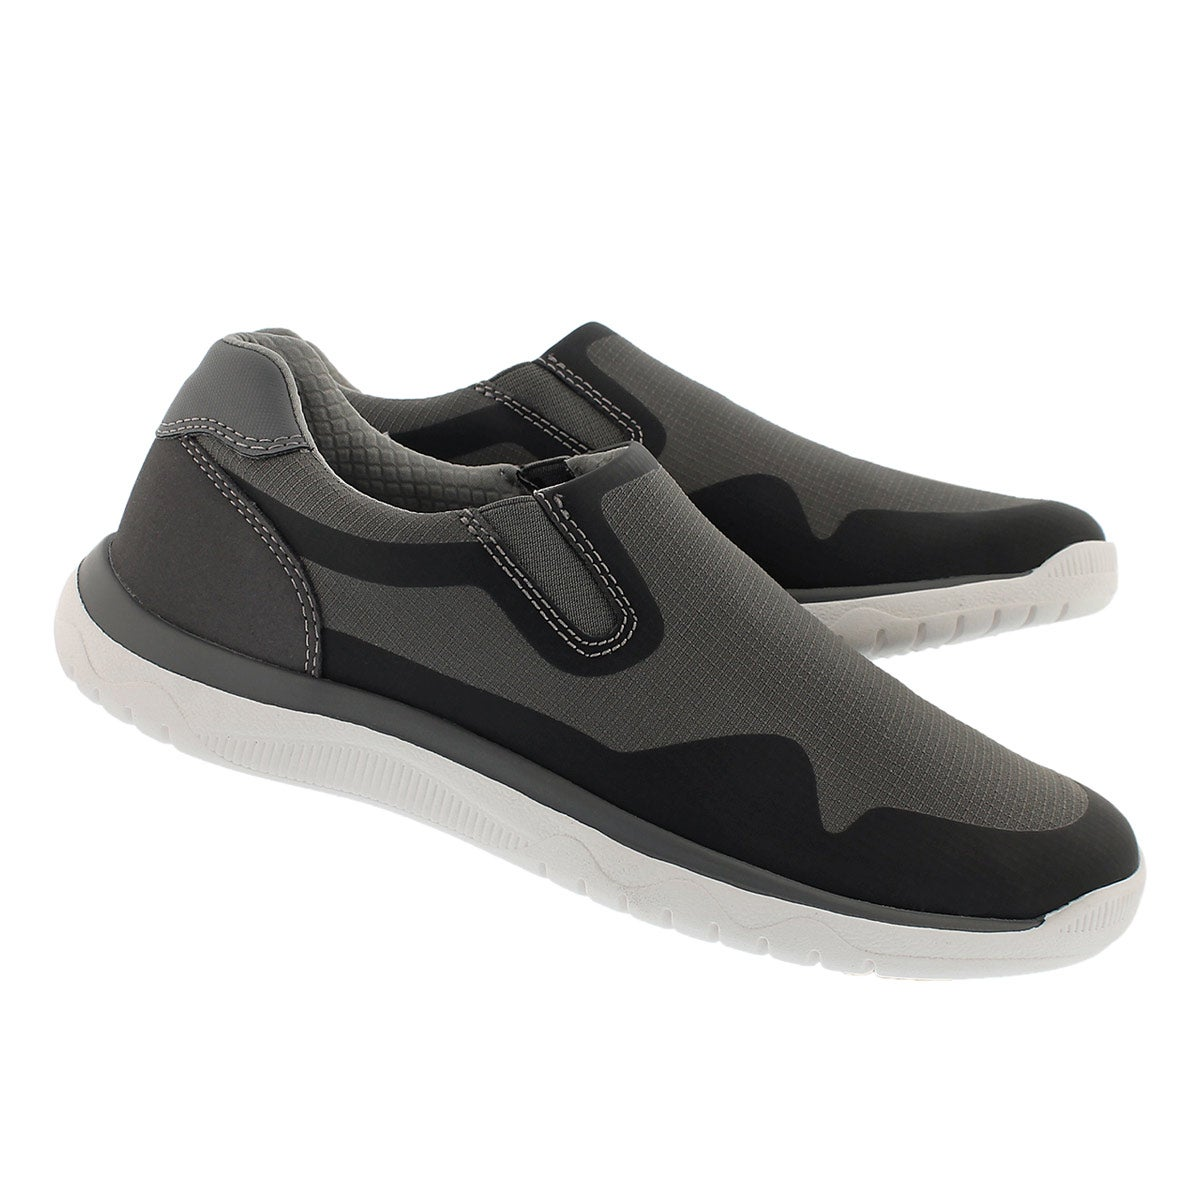 Mns Votta Free grey casual slip on